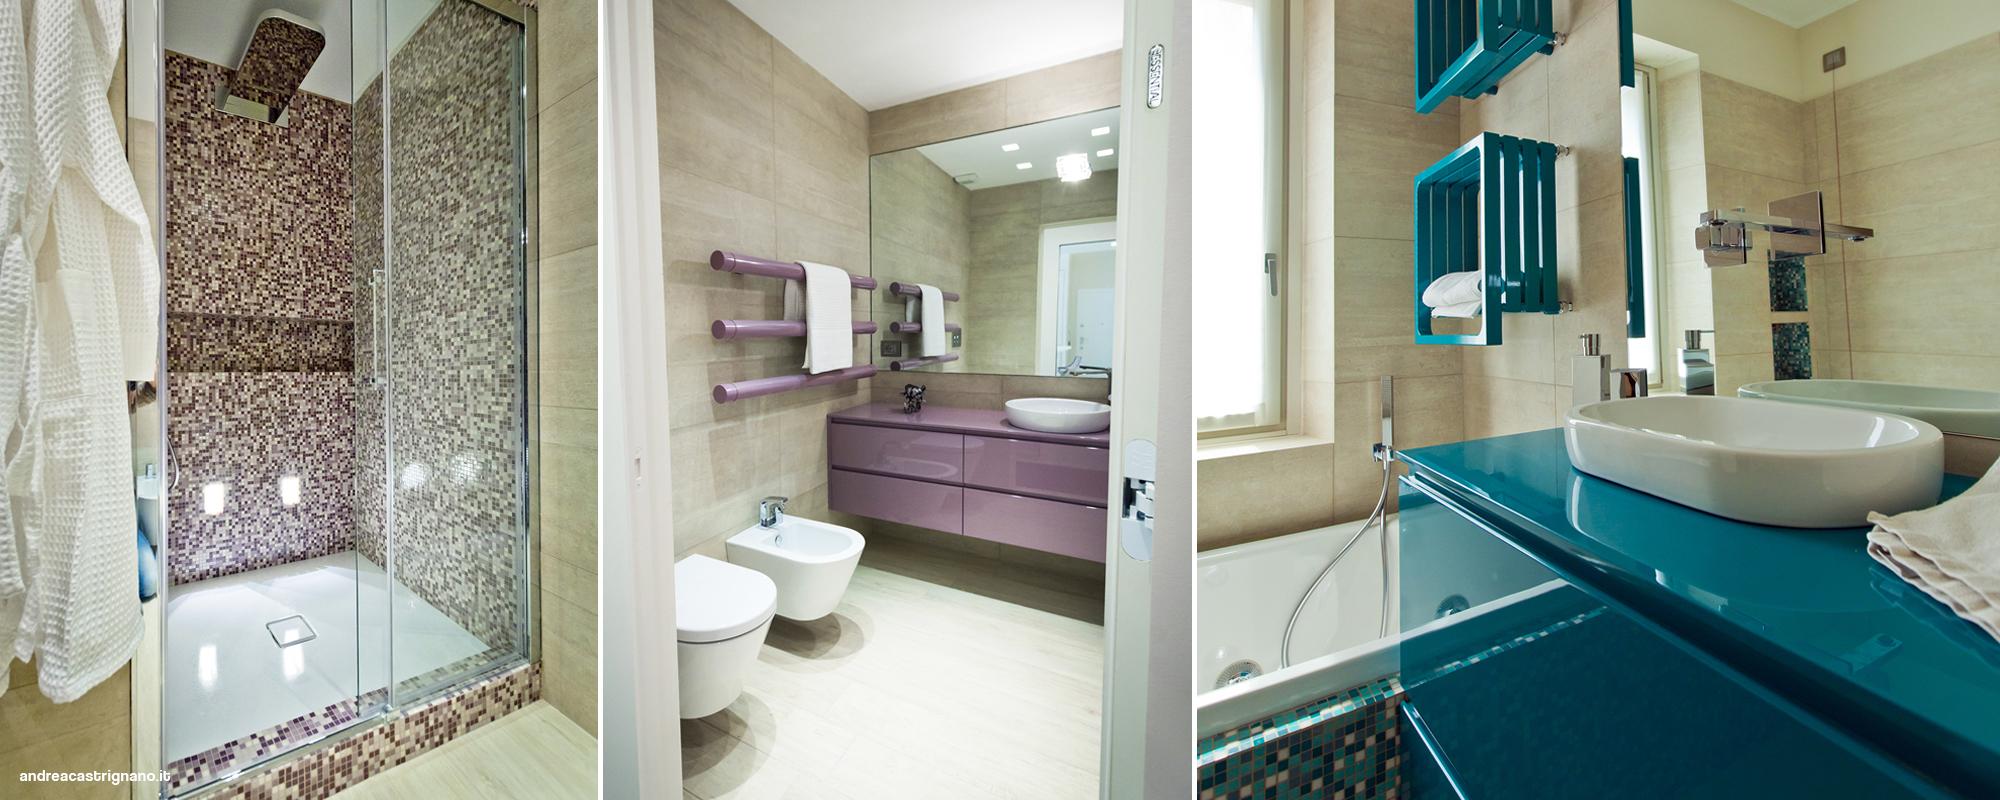 bagni moderni per piccoli spazi | sweetwaterrescue - Bagni Moderni Piccoli Spazi